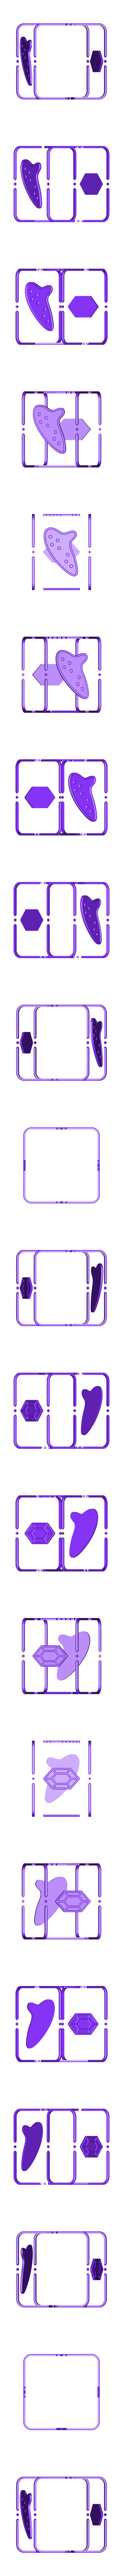 planter_zelda_dual_details.stl Download free STL file Video Game Planter Collection • Object to 3D print, flowalistik